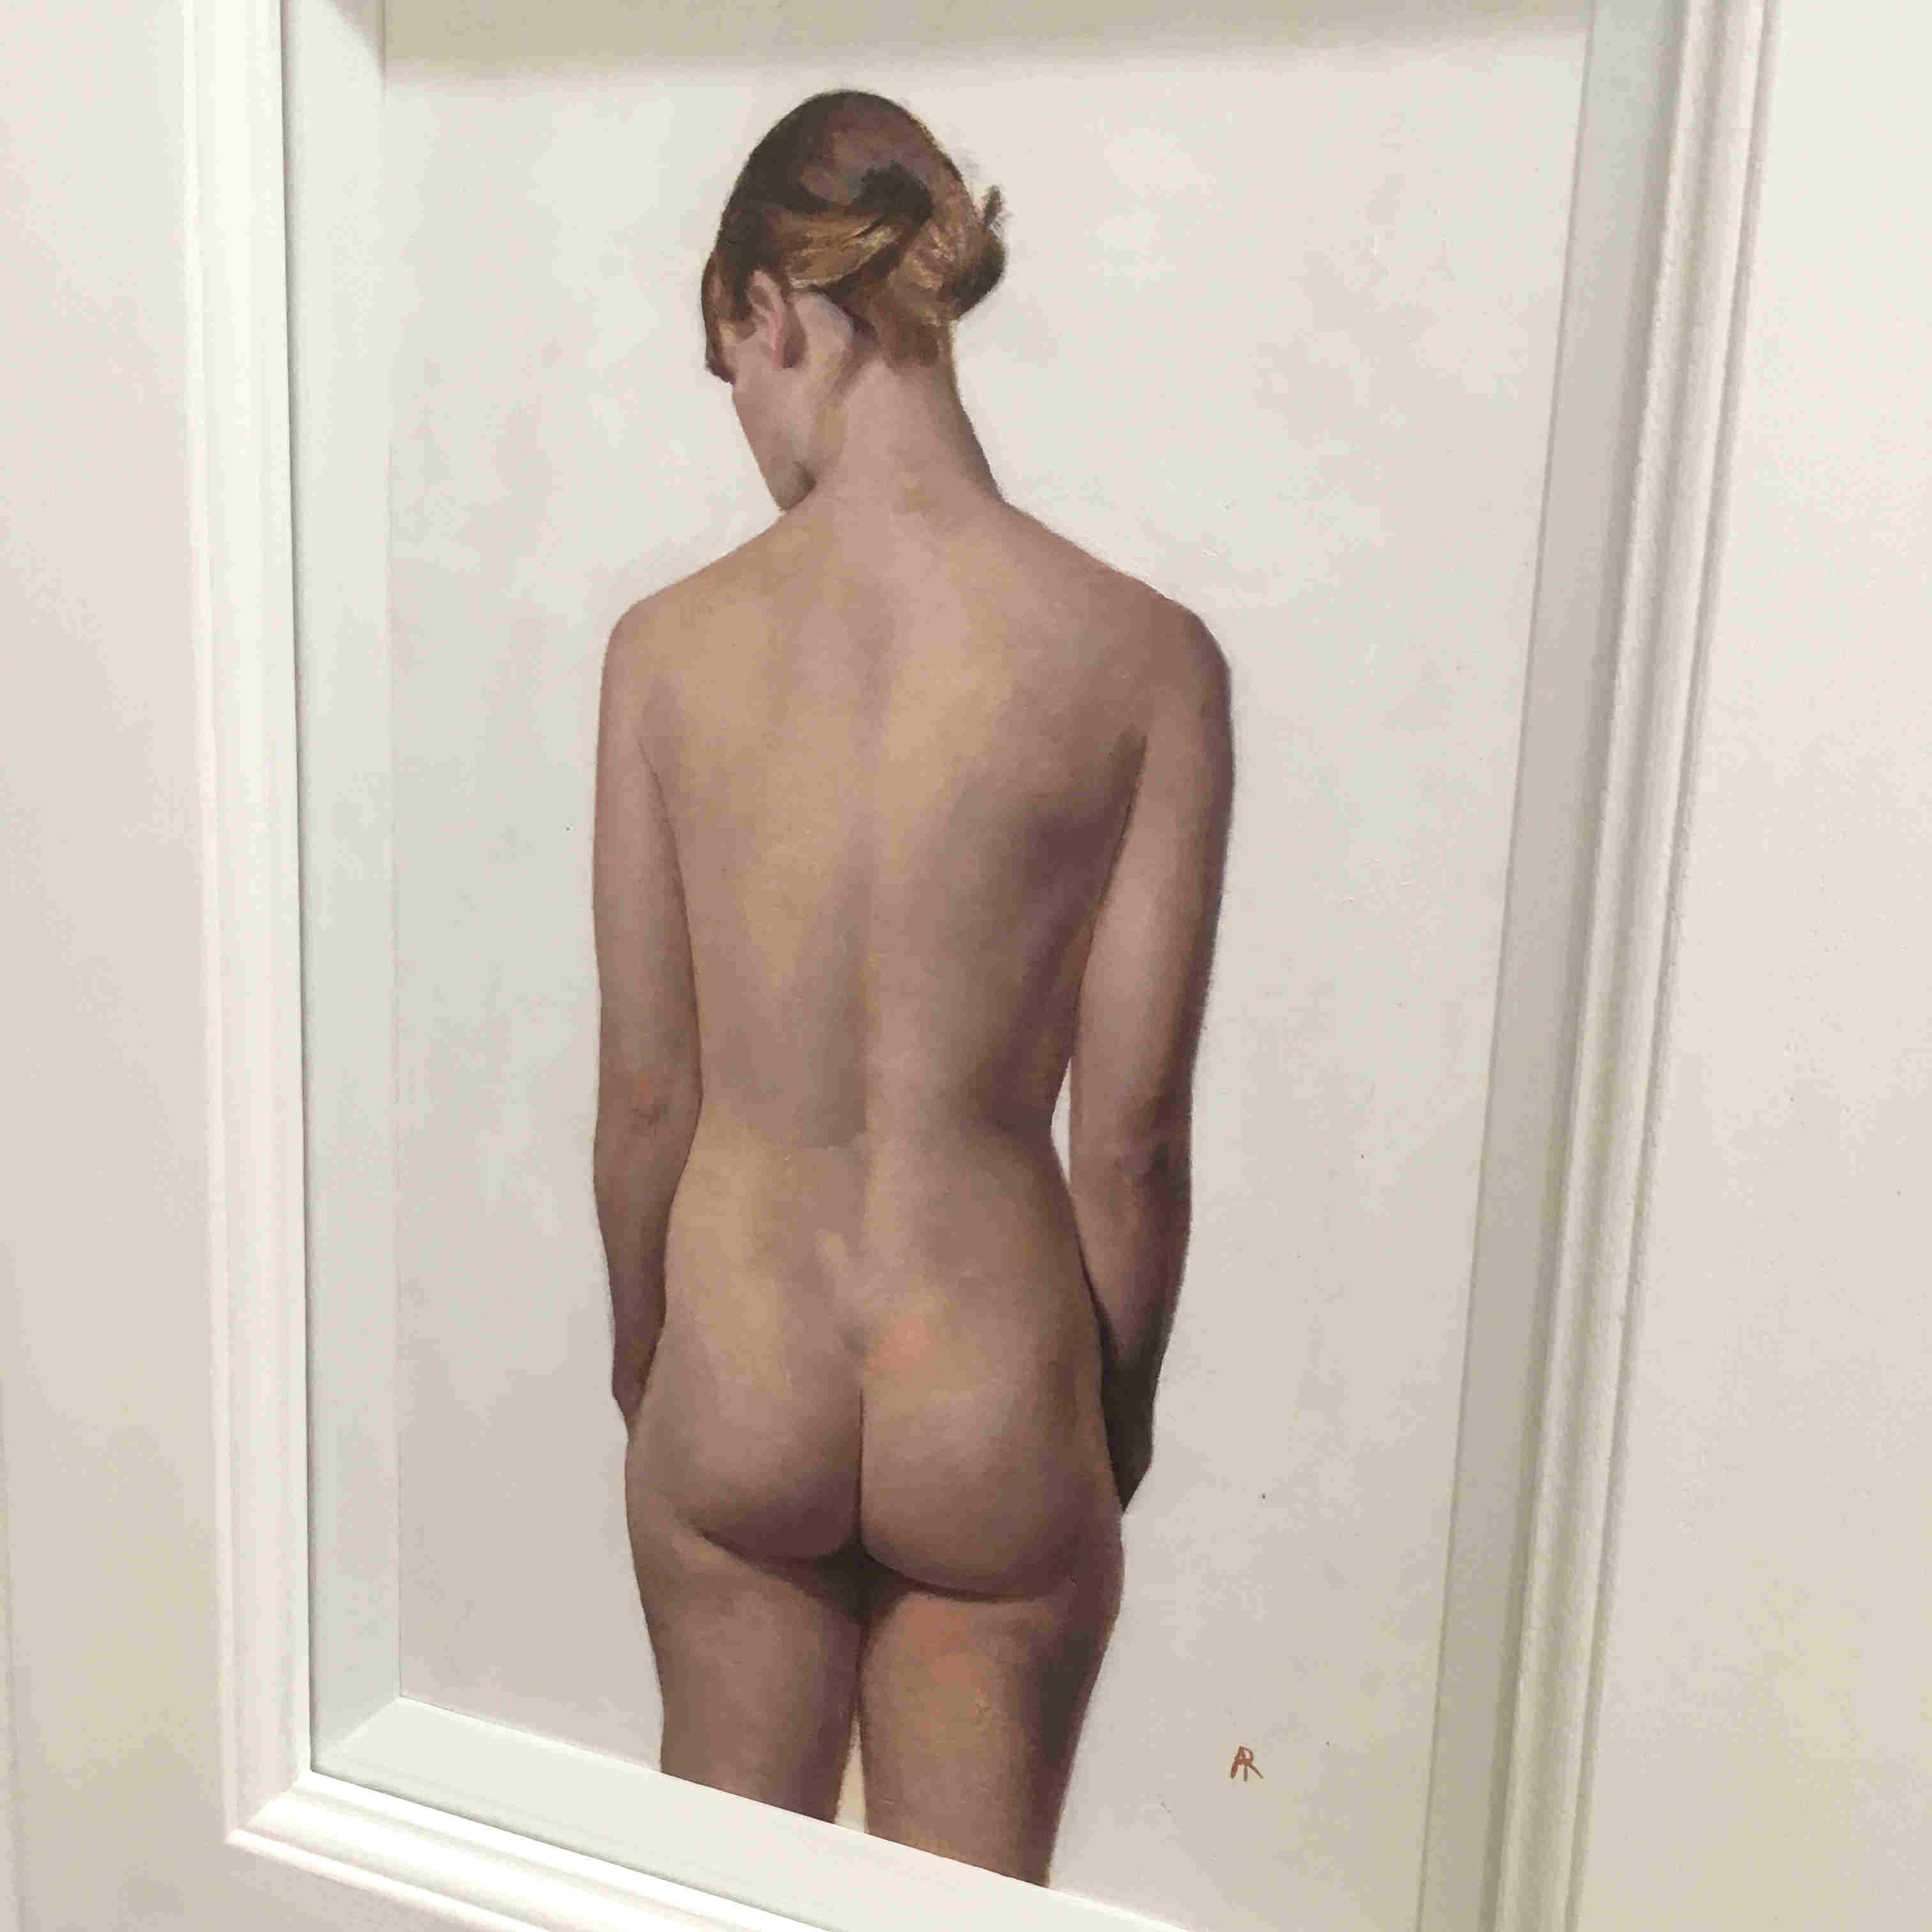 'Consider' by artist Angela Reilly